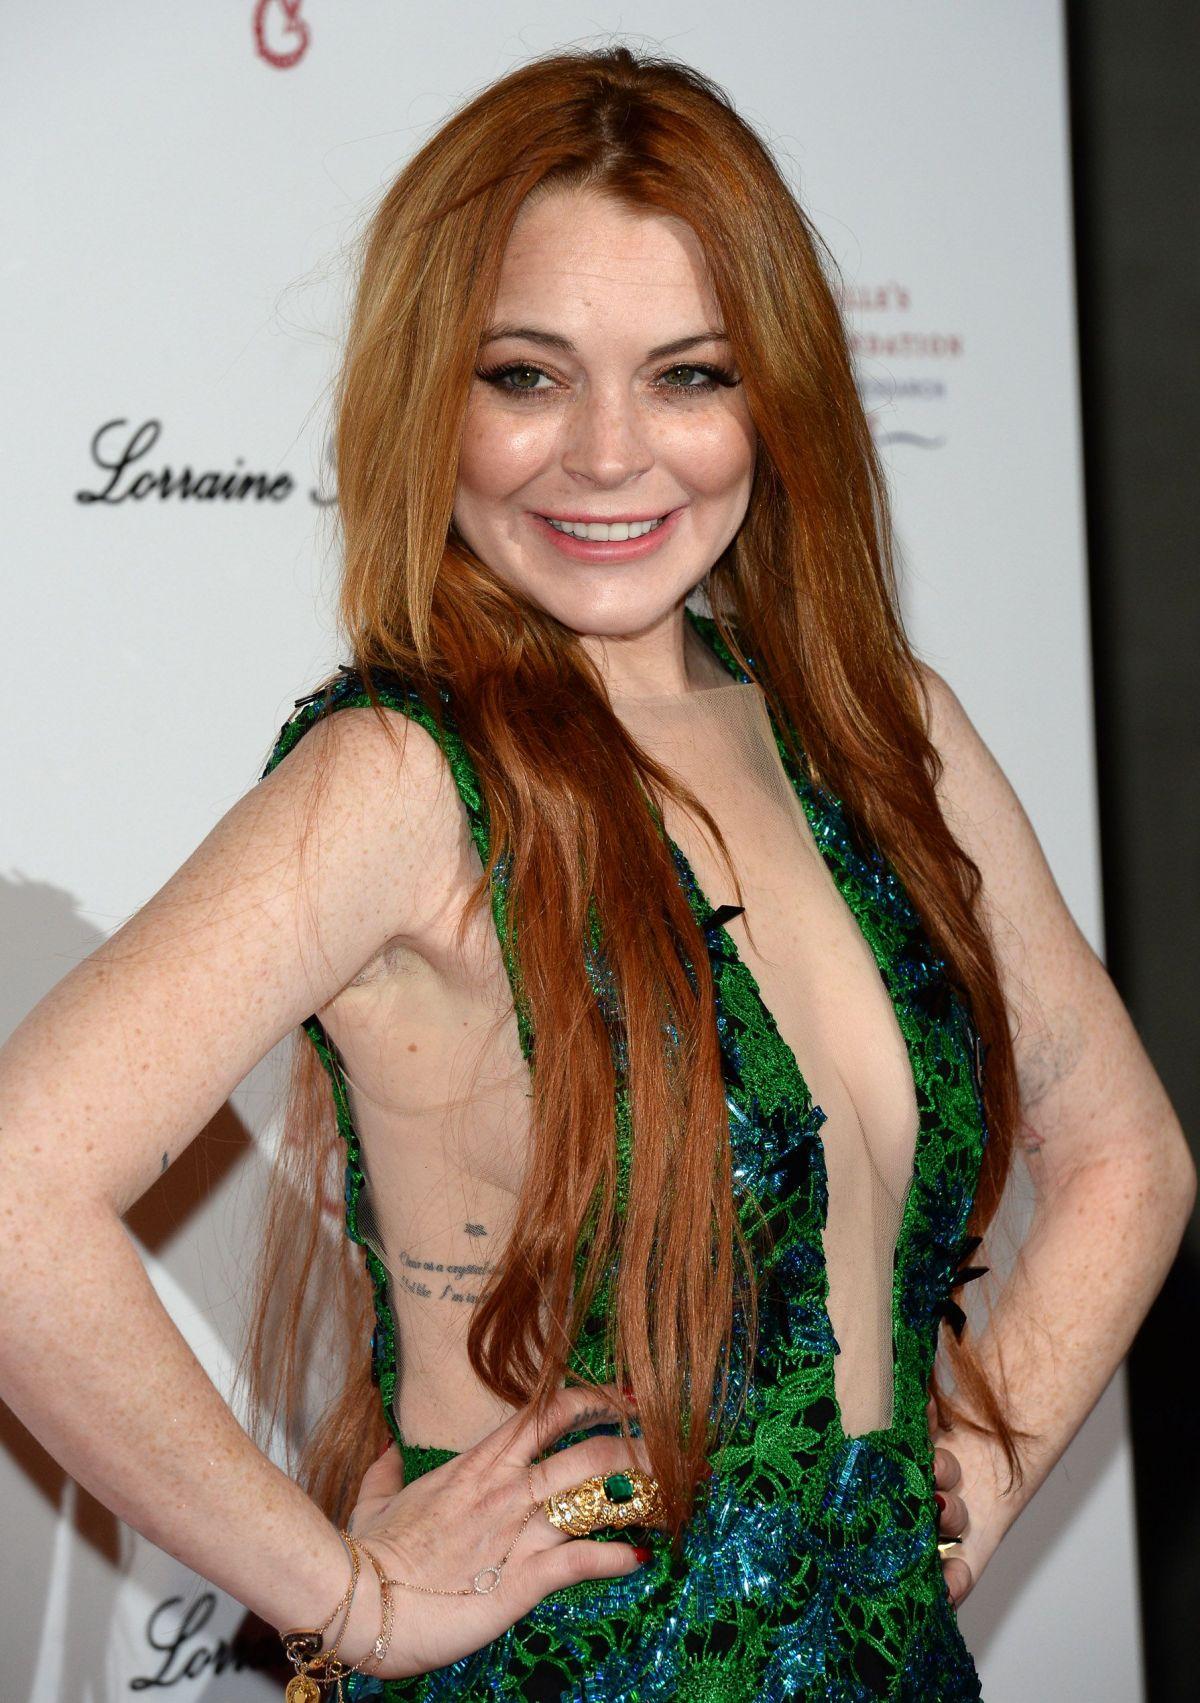 LINDSAY LOHAN at Gabrielle's Gala 2014 in London ... Lindsay Lohan